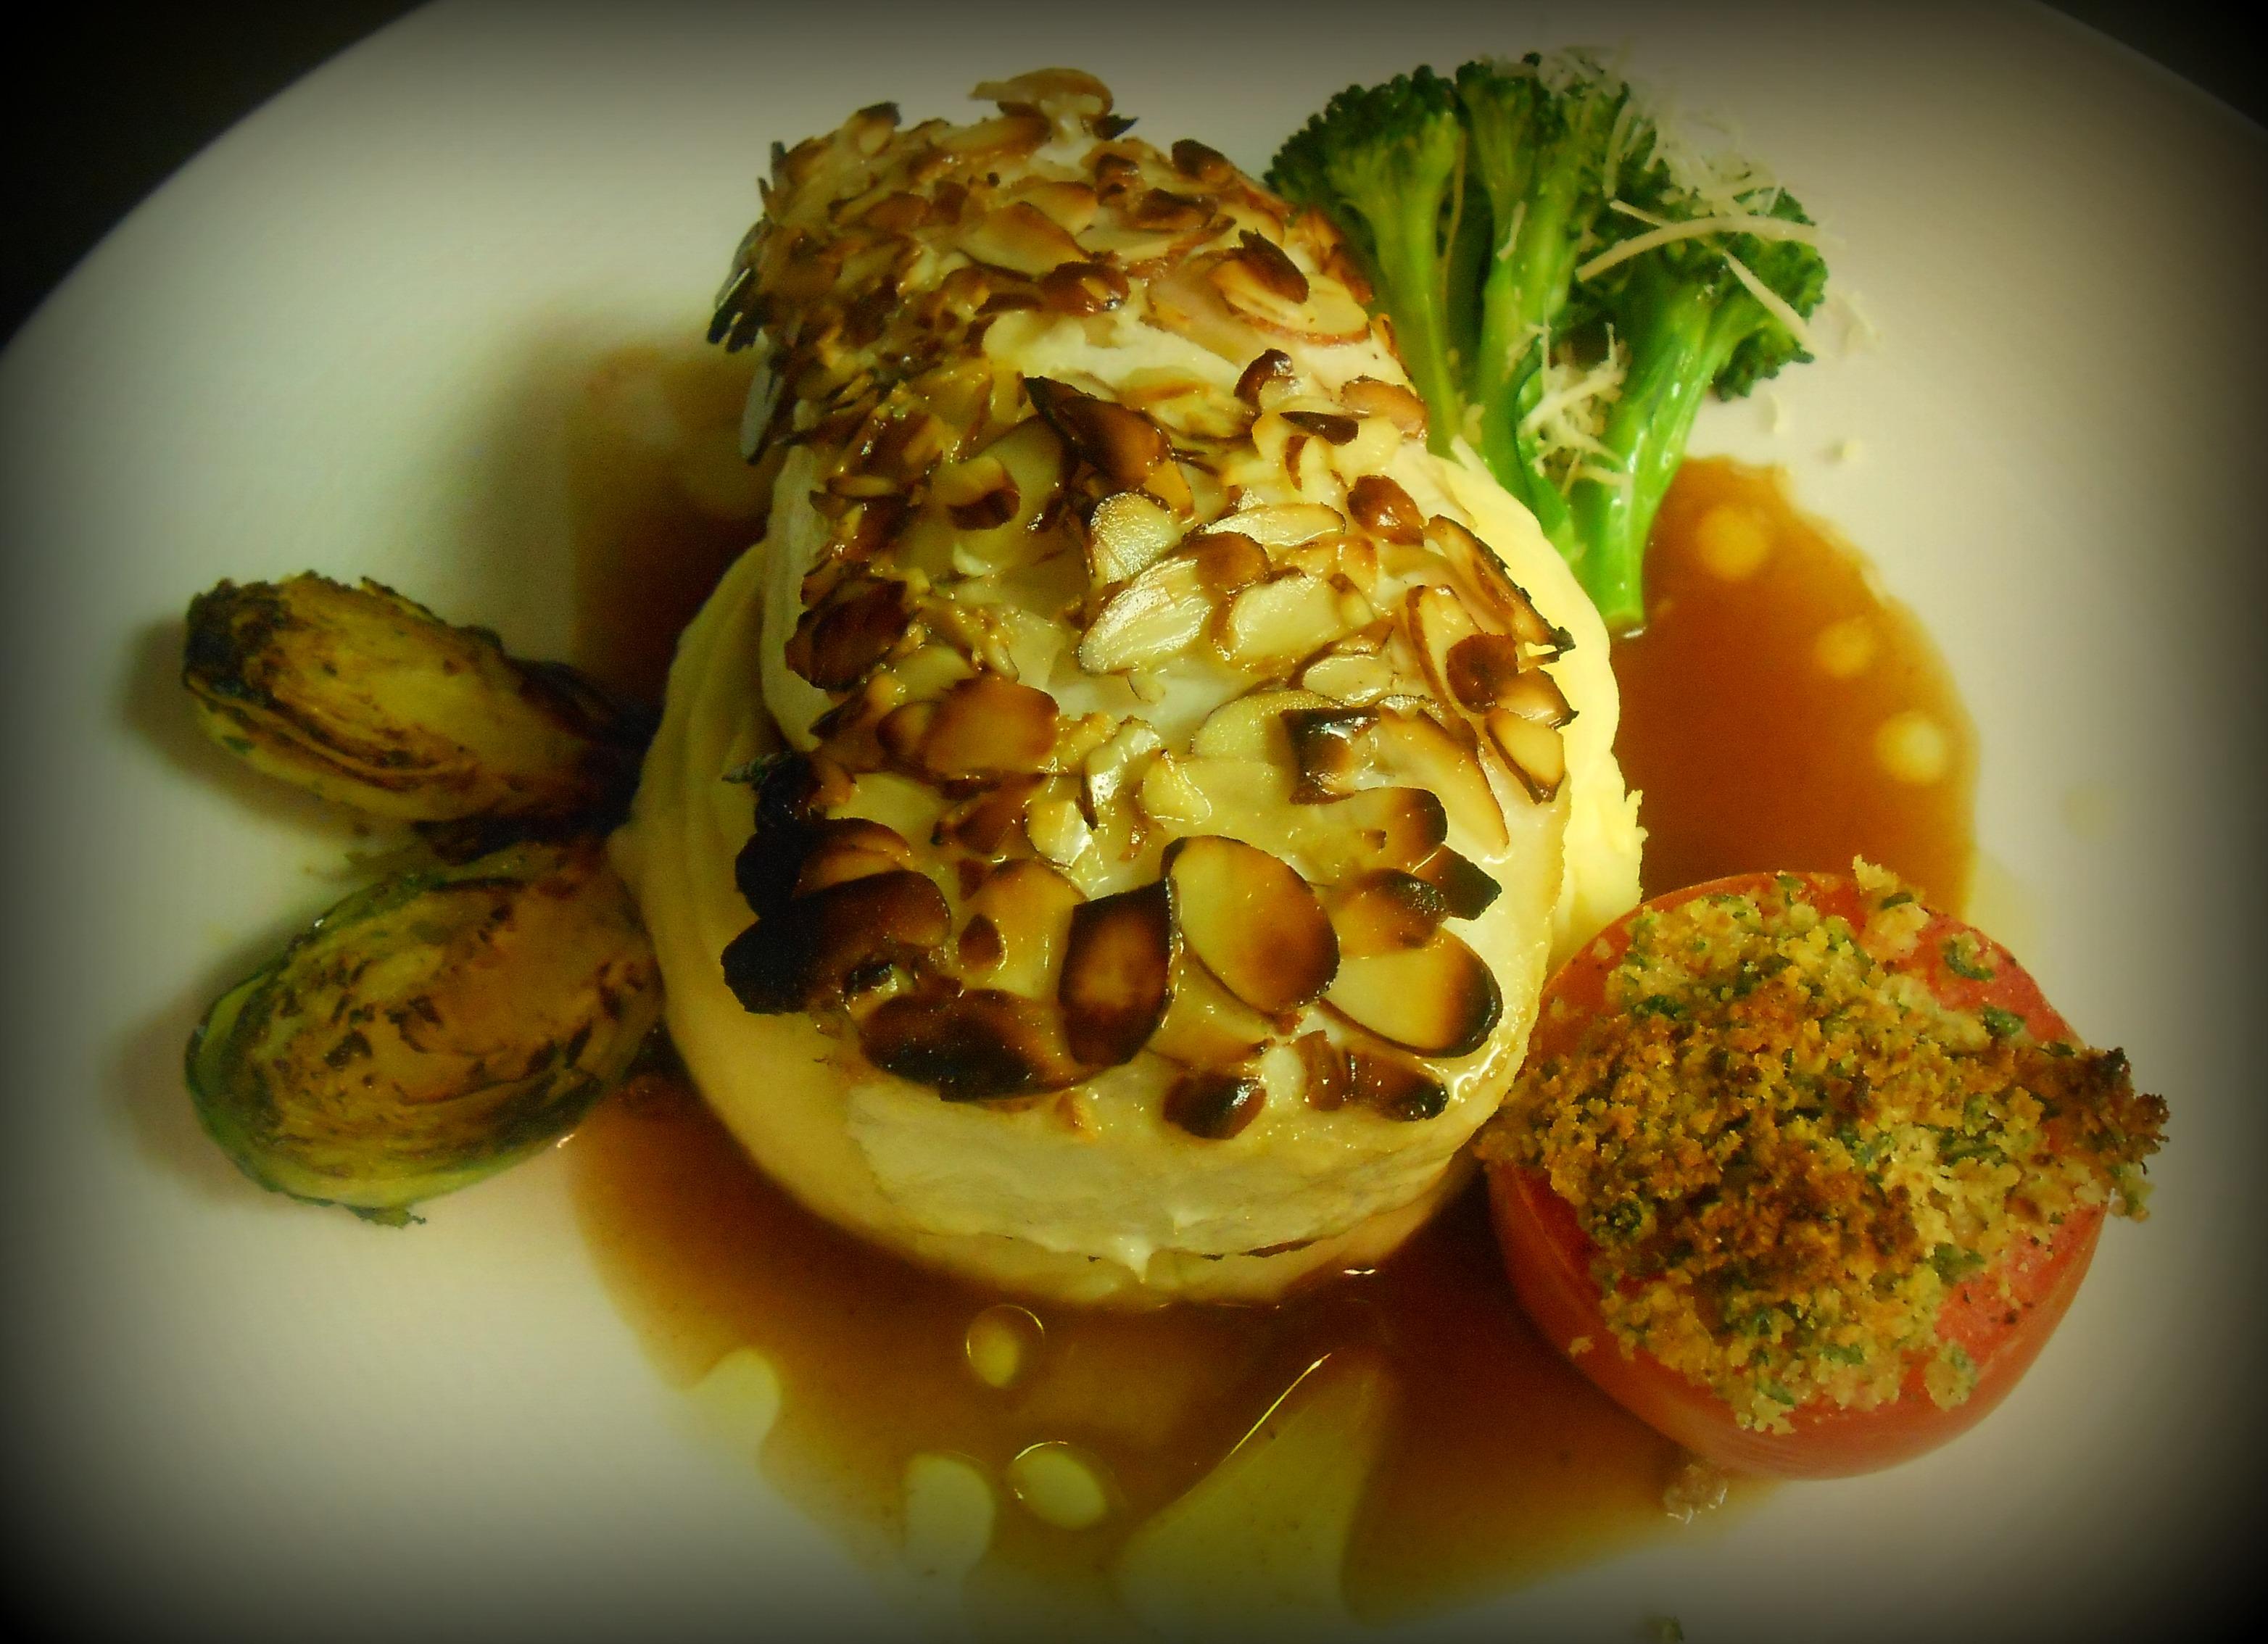 Alaskan Halibut - Piero's Italian Cuisine Alaskan Halibut Dish